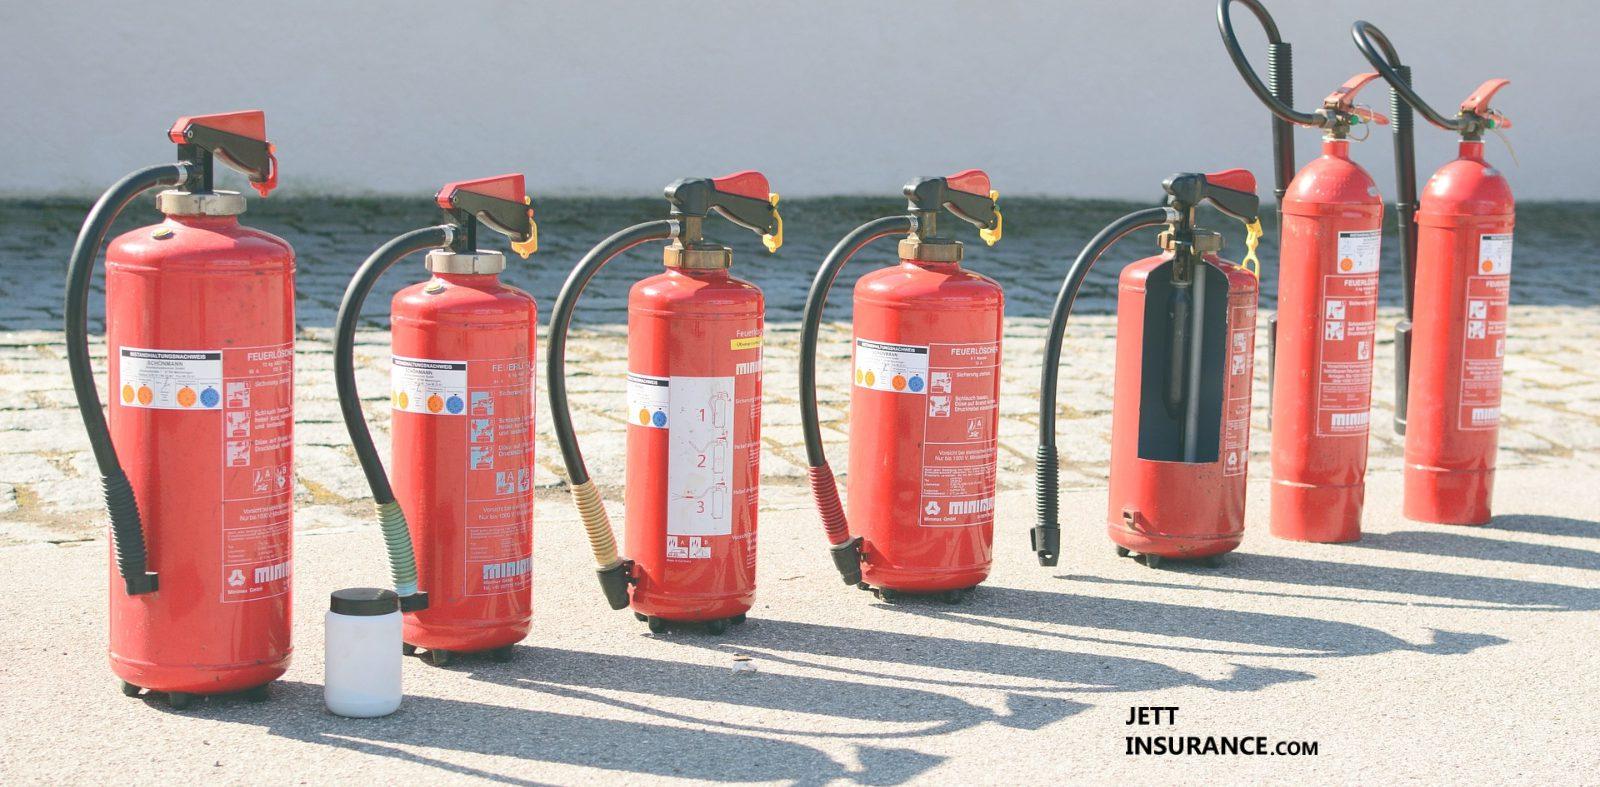 Tips for home fire preparedness